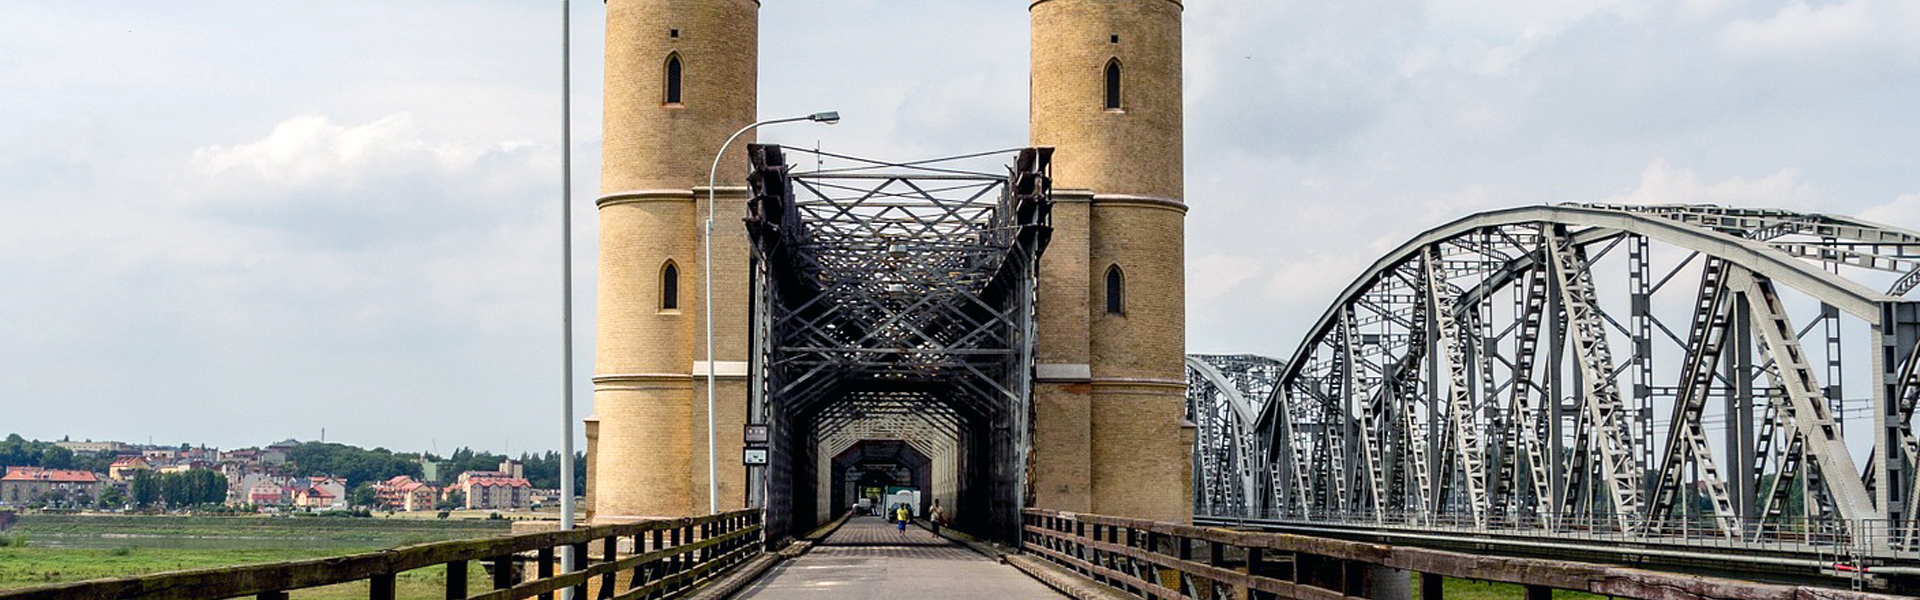 Tczew Most